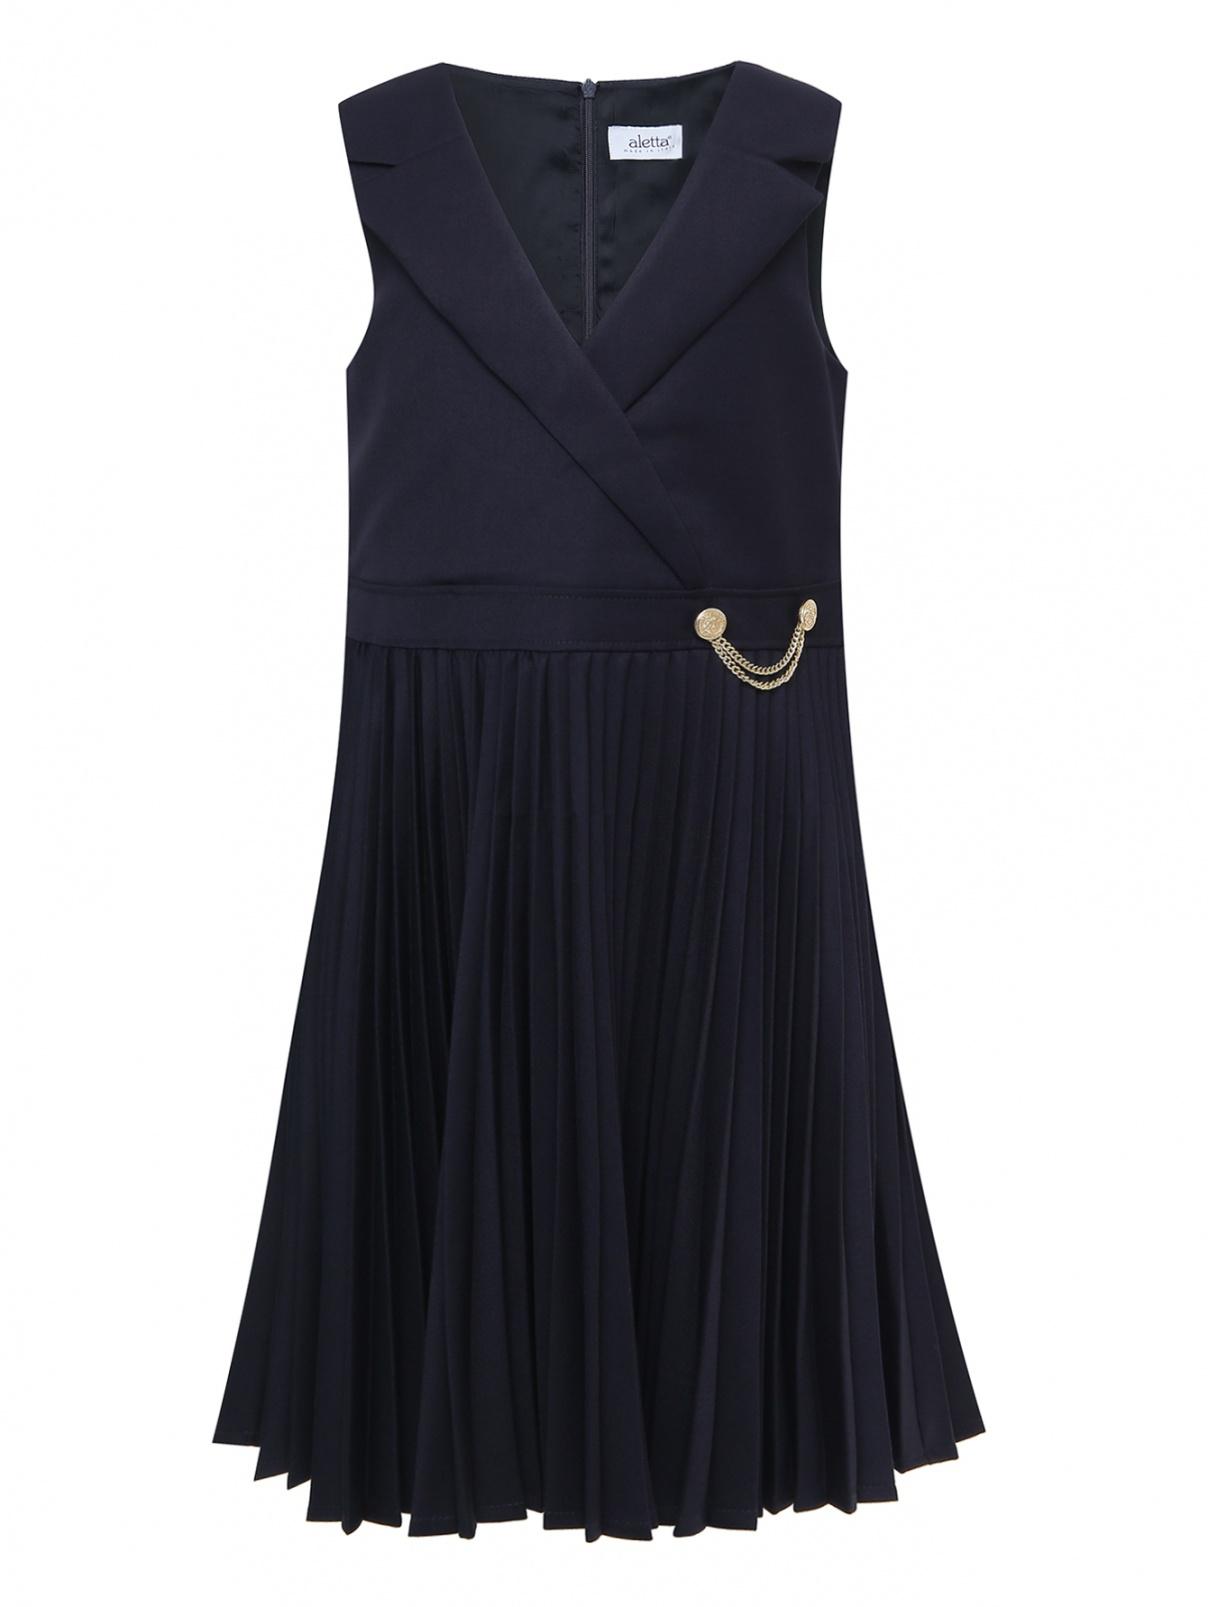 Платье-сарафан с юбкой-гофре Aletta Couture  –  Общий вид